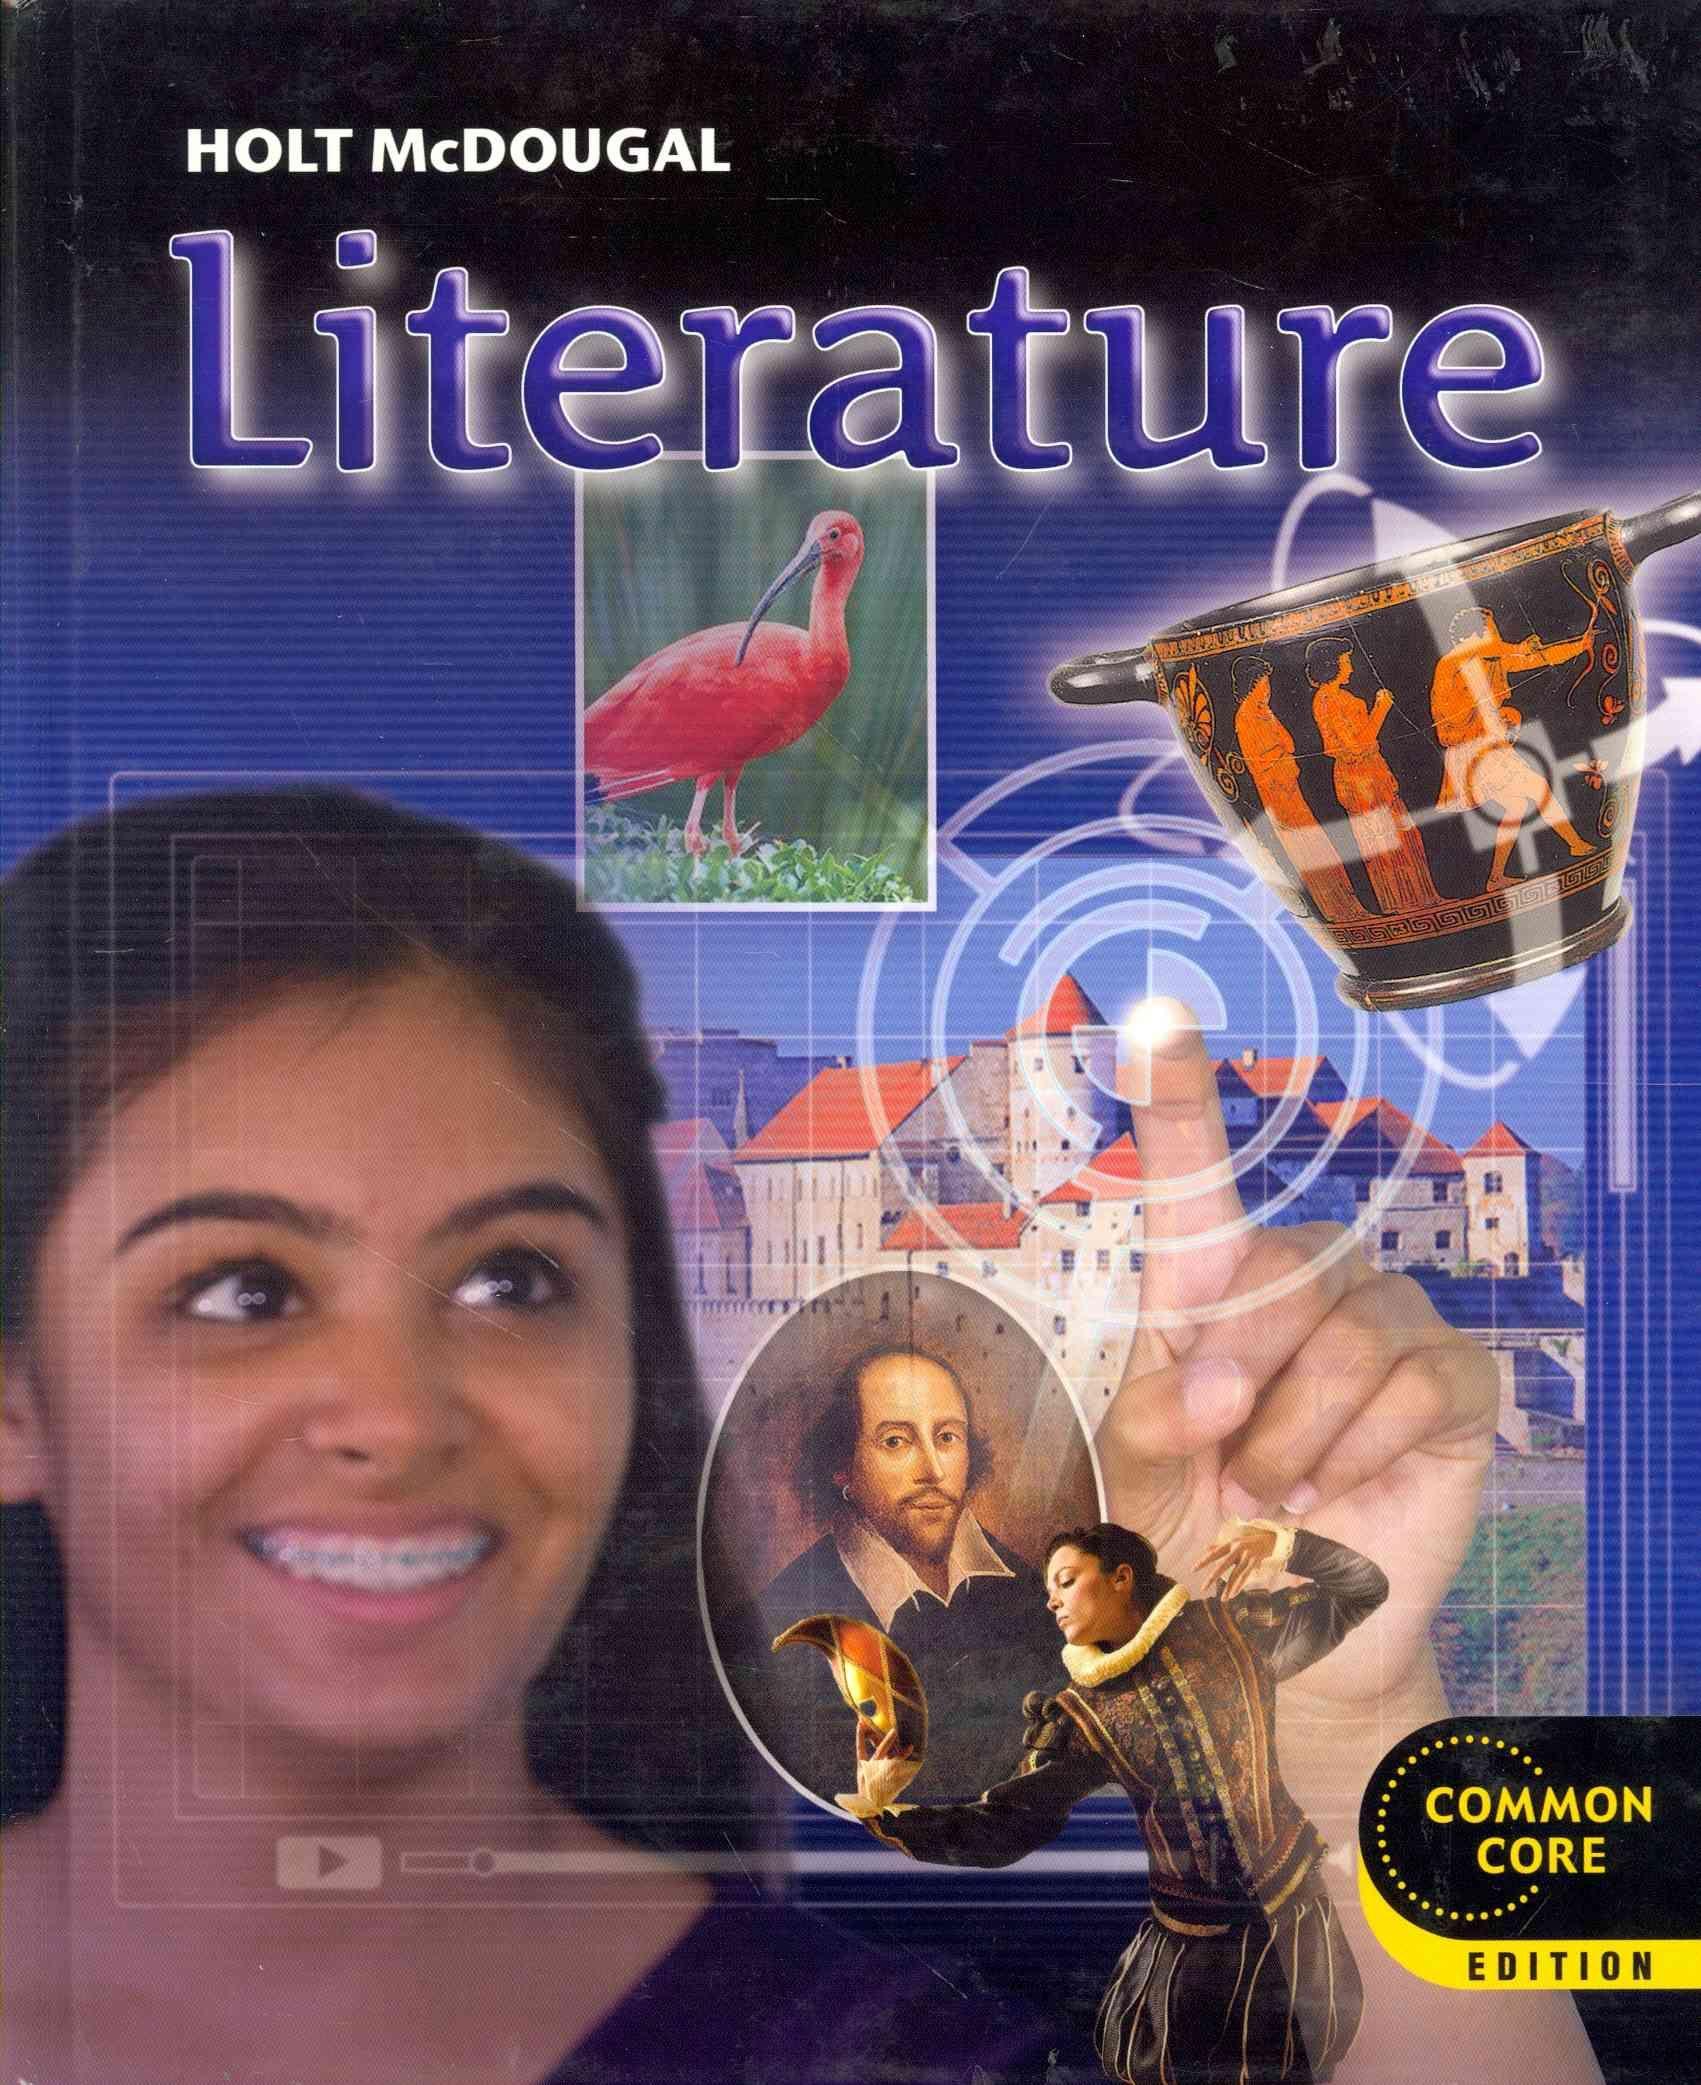 Holt Mcdougal Literature Grade 9 Common Core Edition